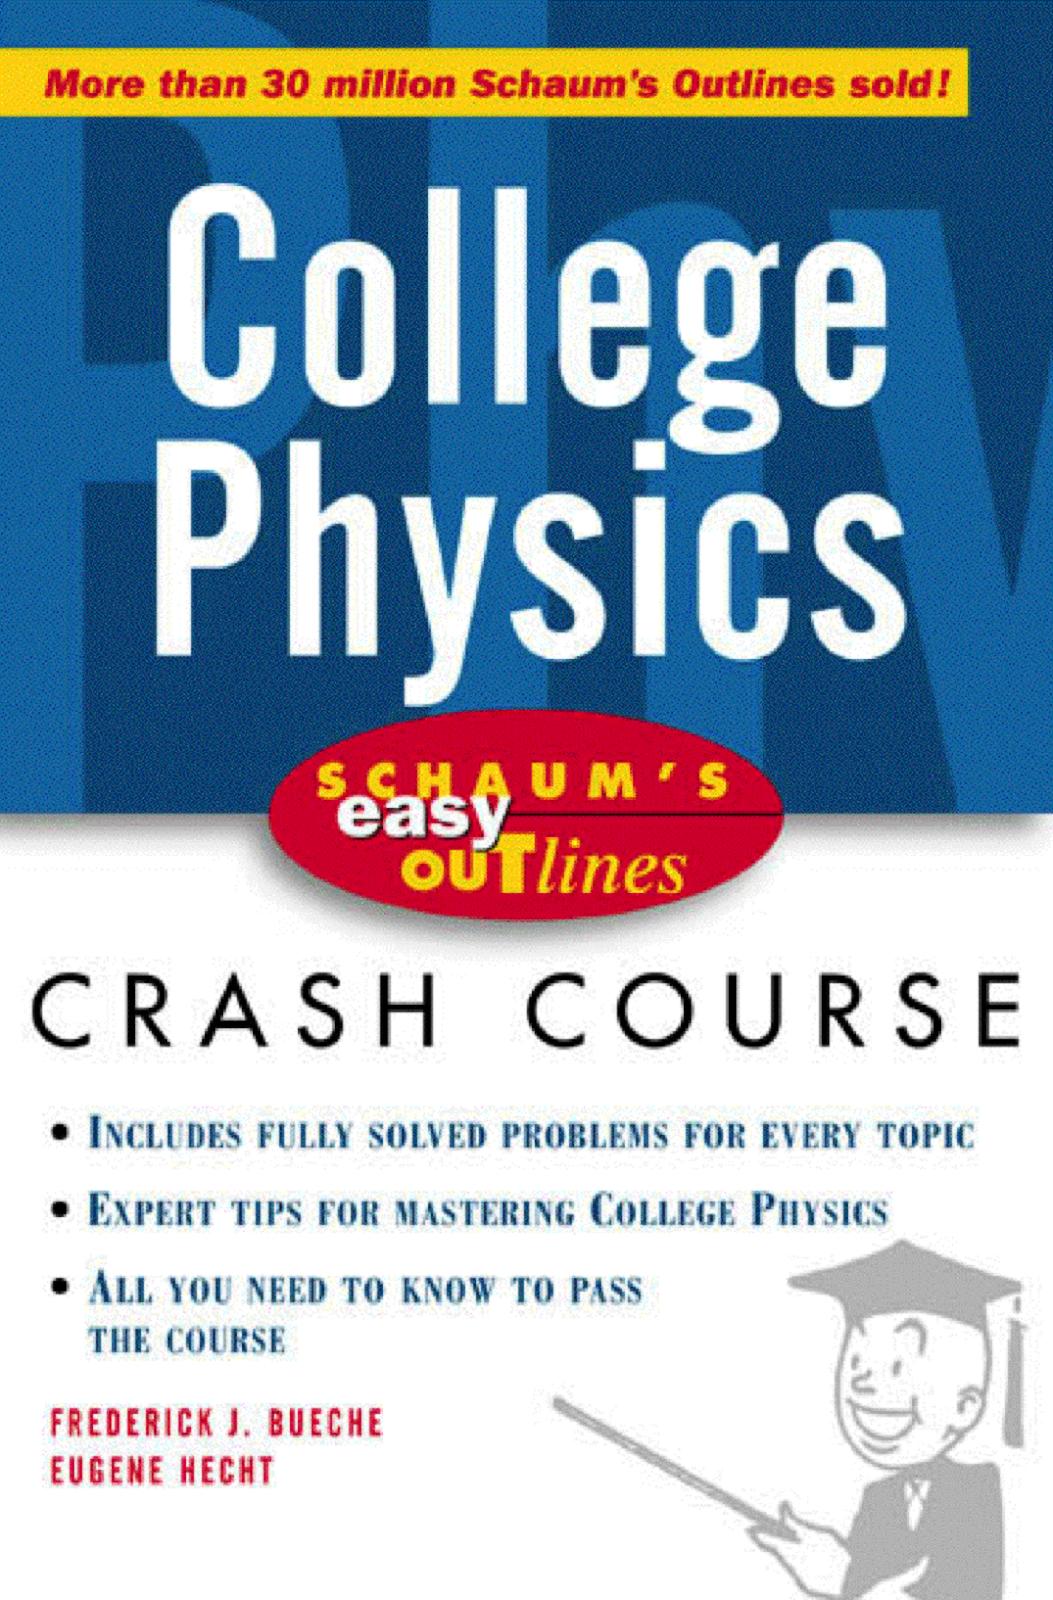 FREE PDF BOOKS OF PHYSICS ~ House of Physics